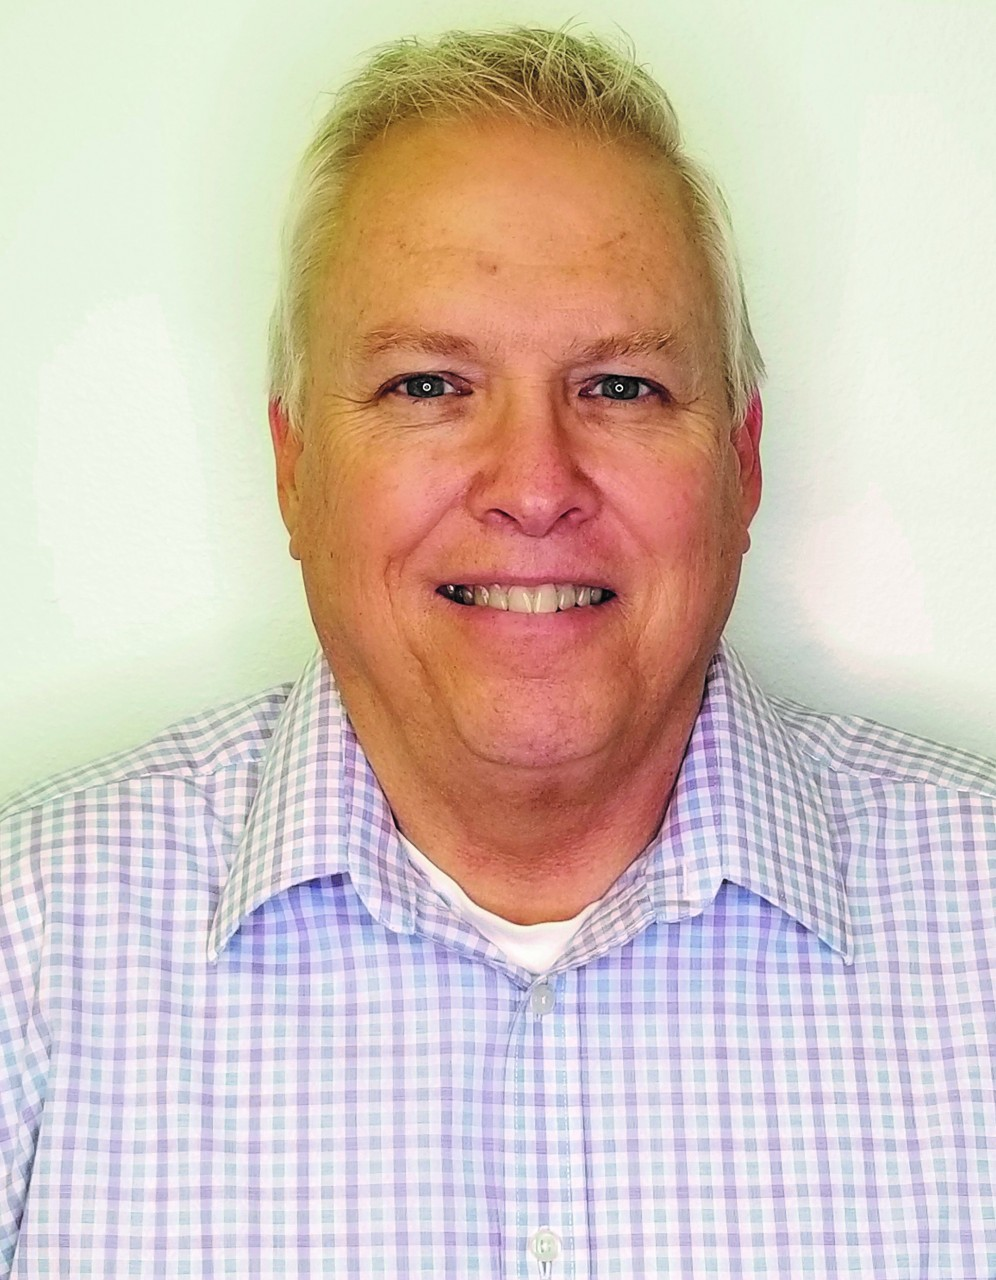 Buddy Hunt serves in eastern Oklahoma